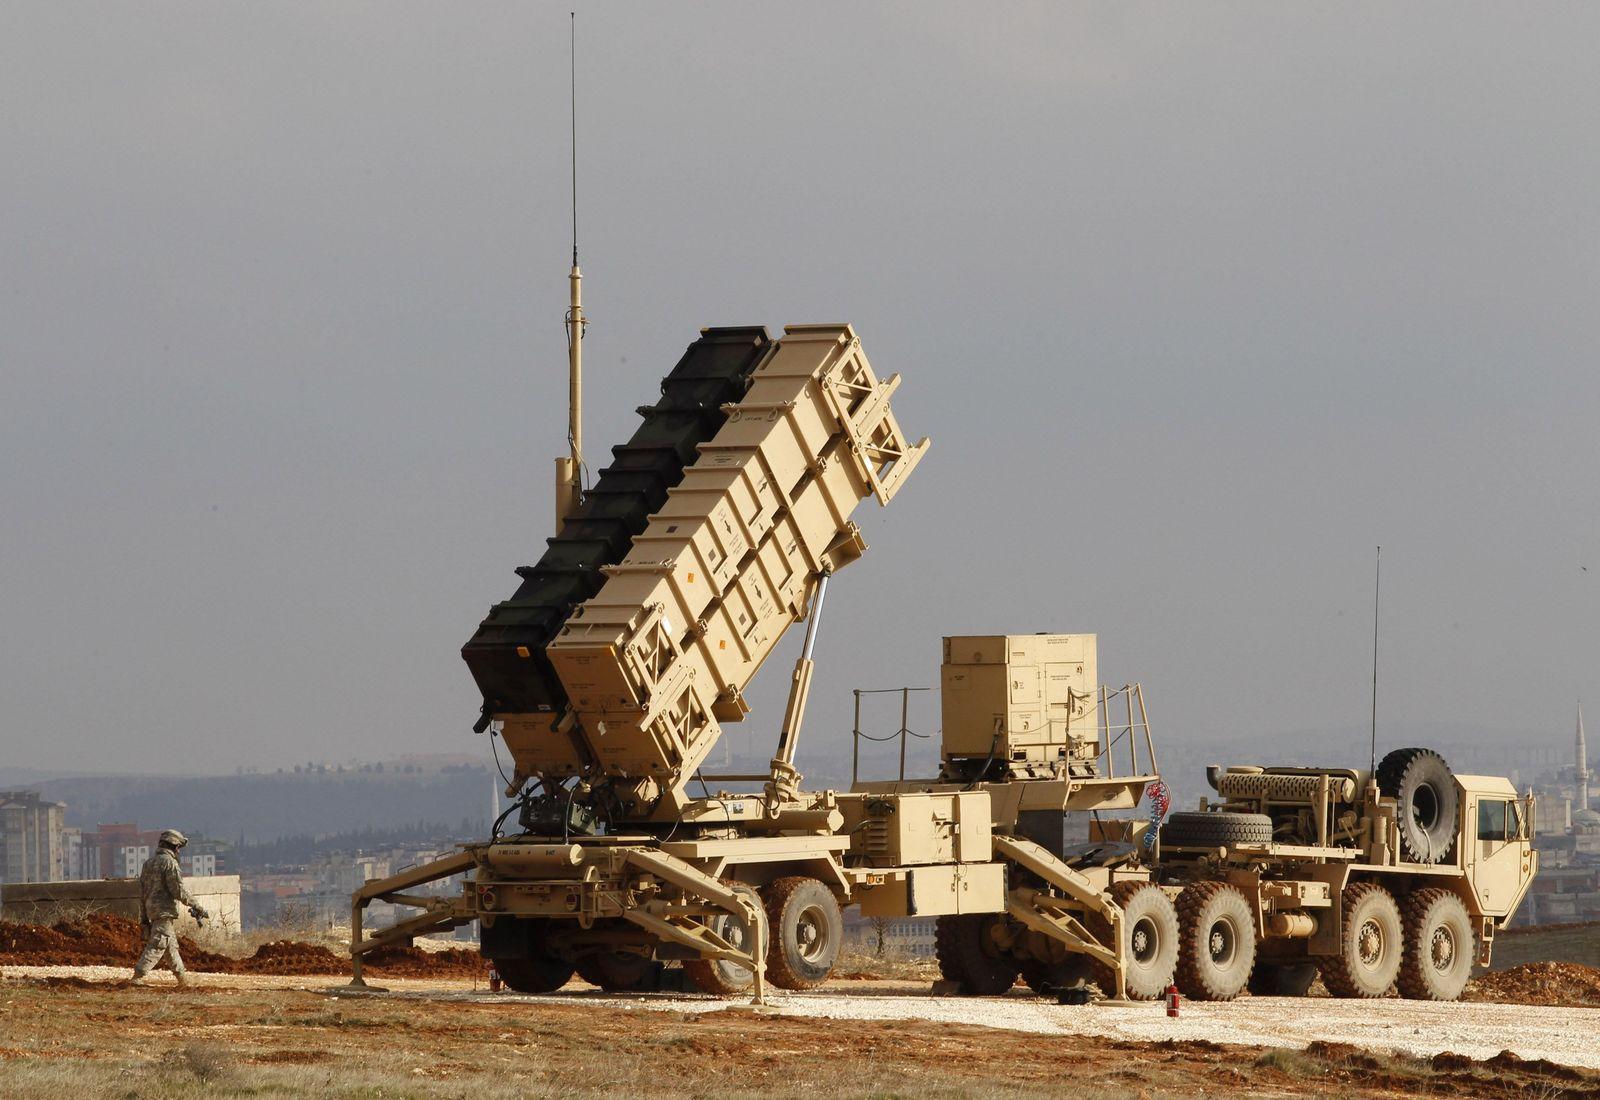 USA-QATAR patriot luftwaffe air defense